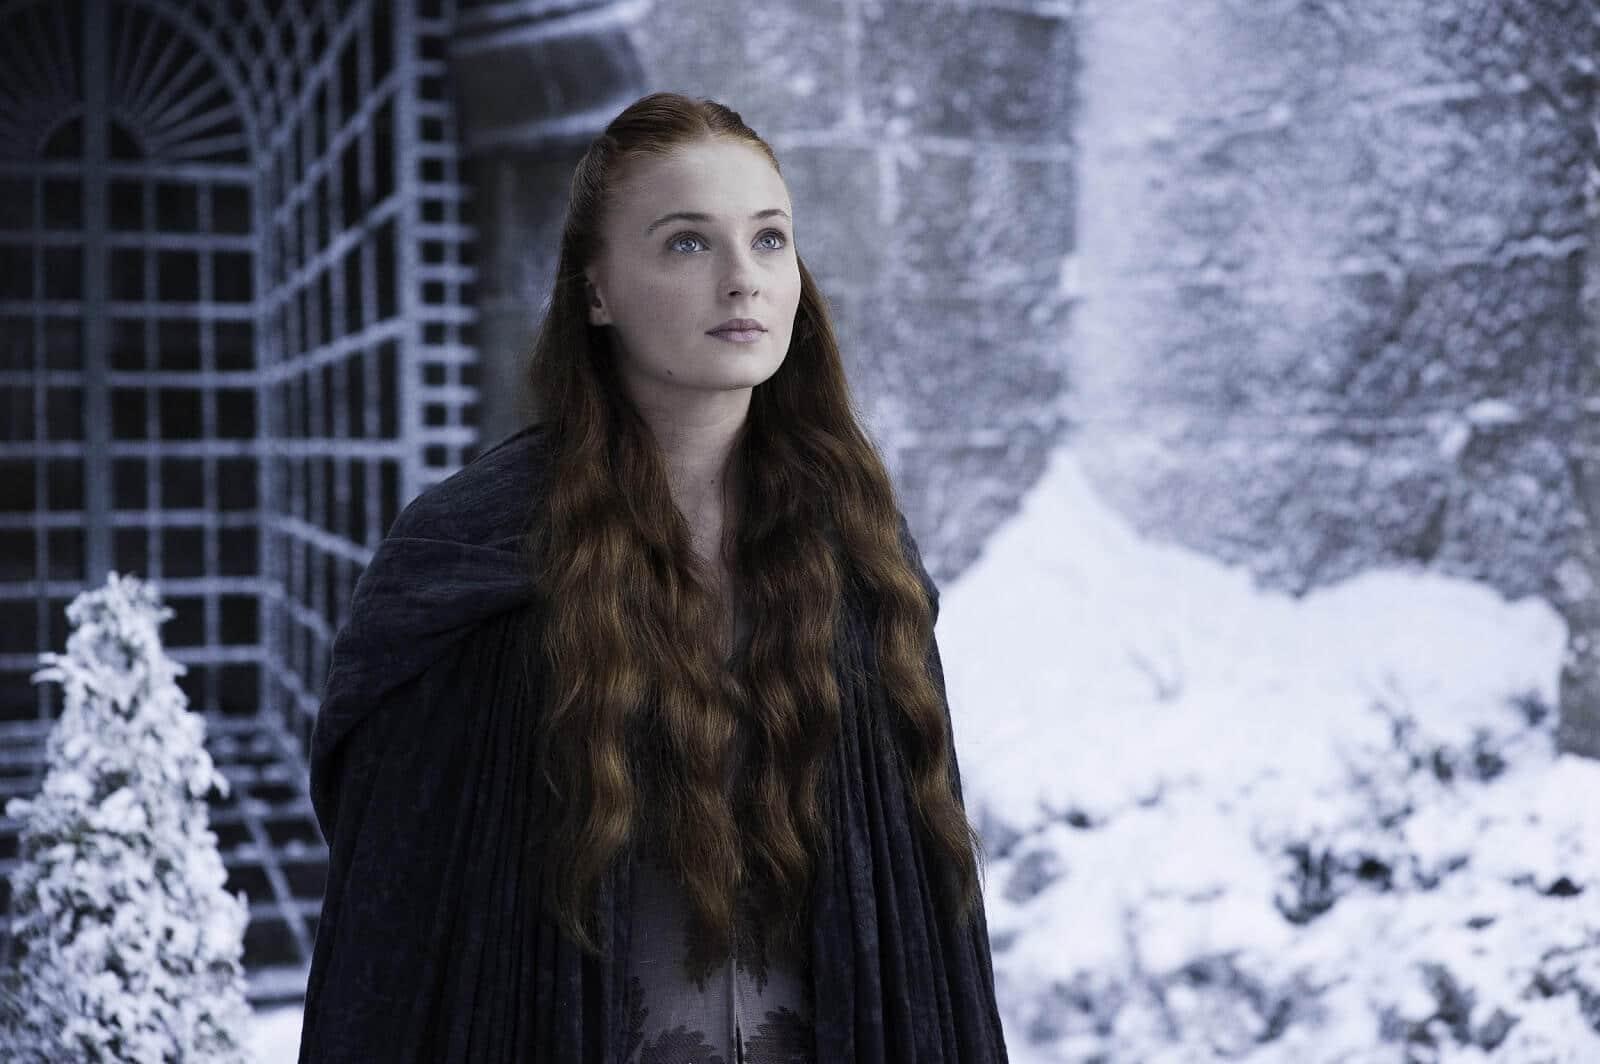 What is Alliteration - Sansa Stark